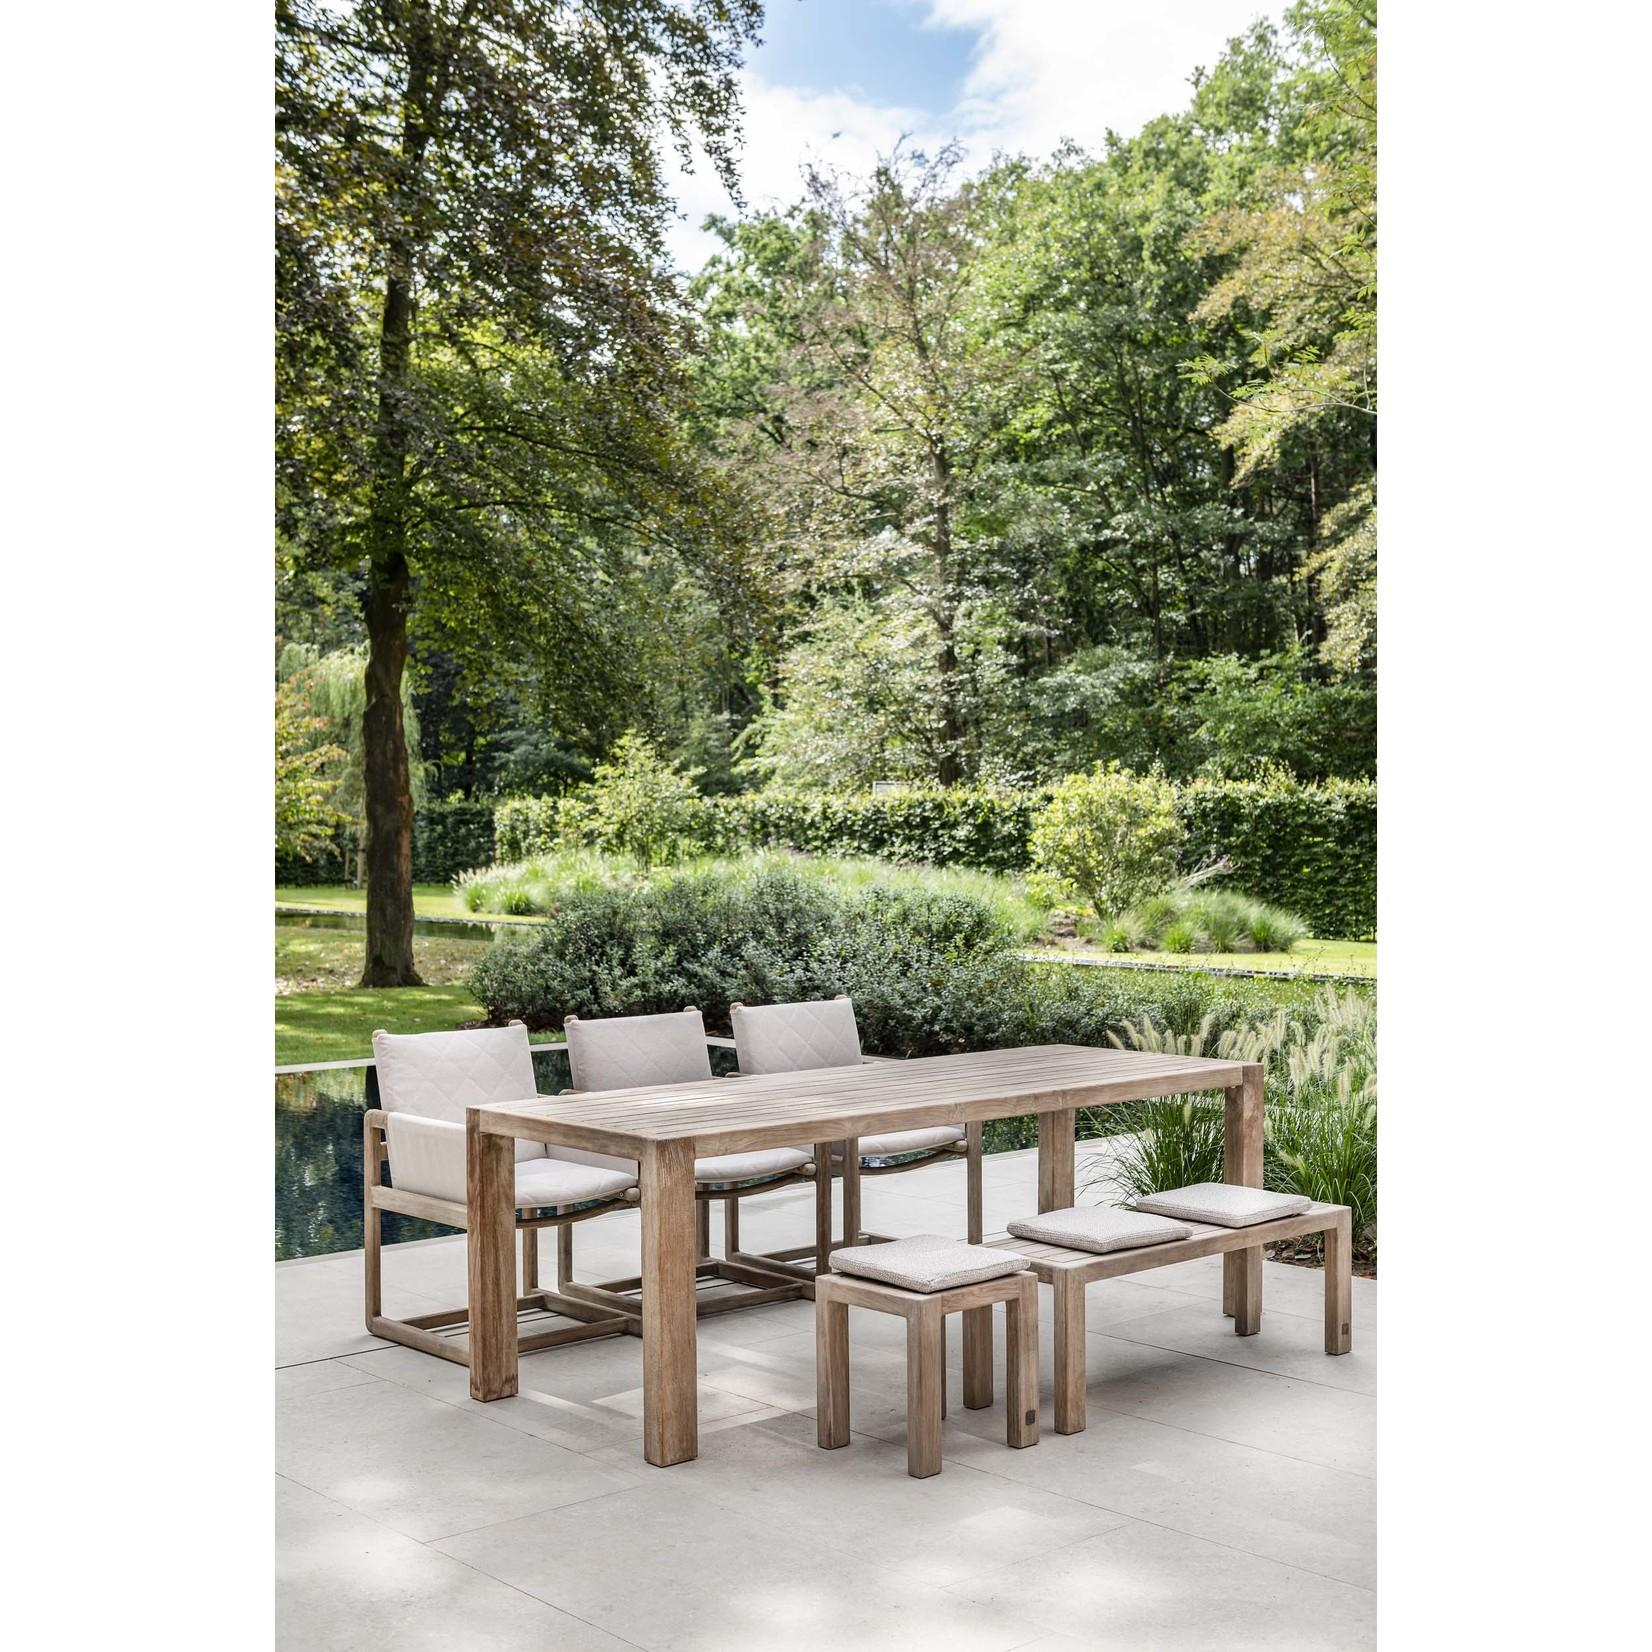 Gommaire Rectangular Table Sandy Medium   Reclaimed Teak Natural Grey